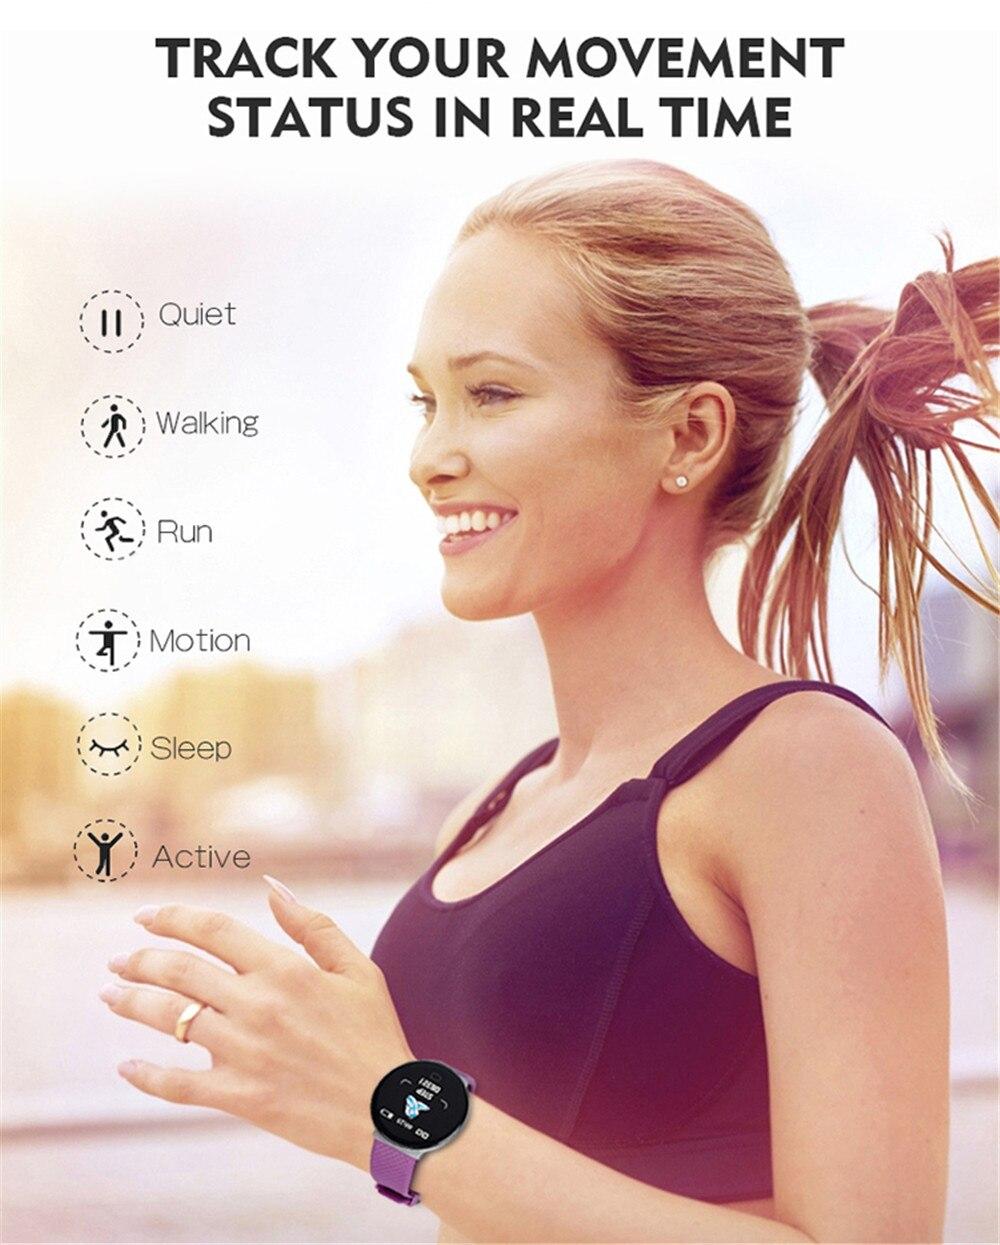 Hc2d46475d6e64e3b80a3814672726cfeN Smart Bracelet 1.3'' Screen Pedometer Fitness Tracker Ip67 Waterproof Blood Pressure Heart Rate Monitor Smart Band Women Men